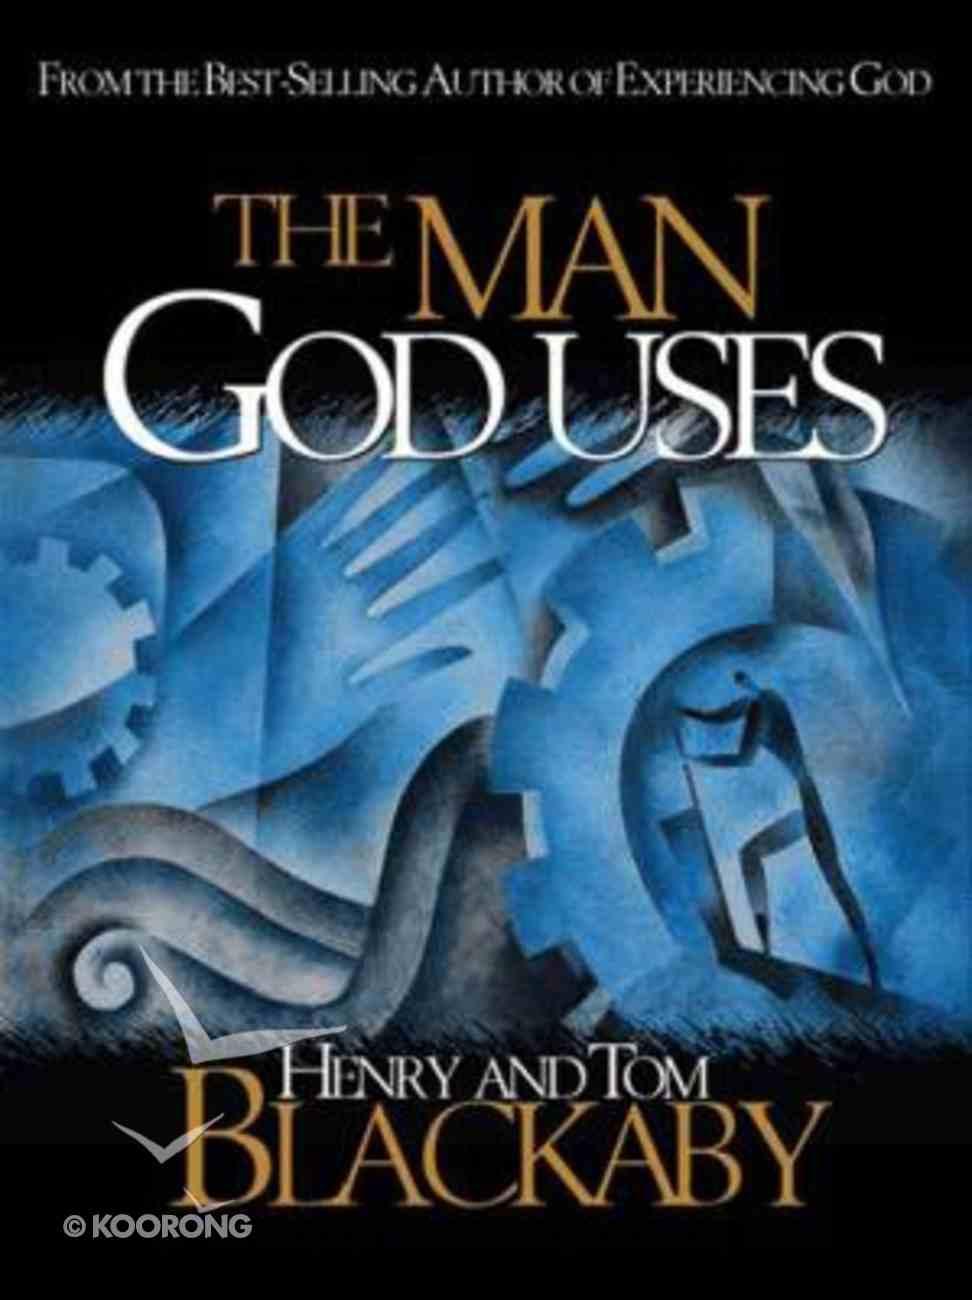 The Man God Uses Hardback